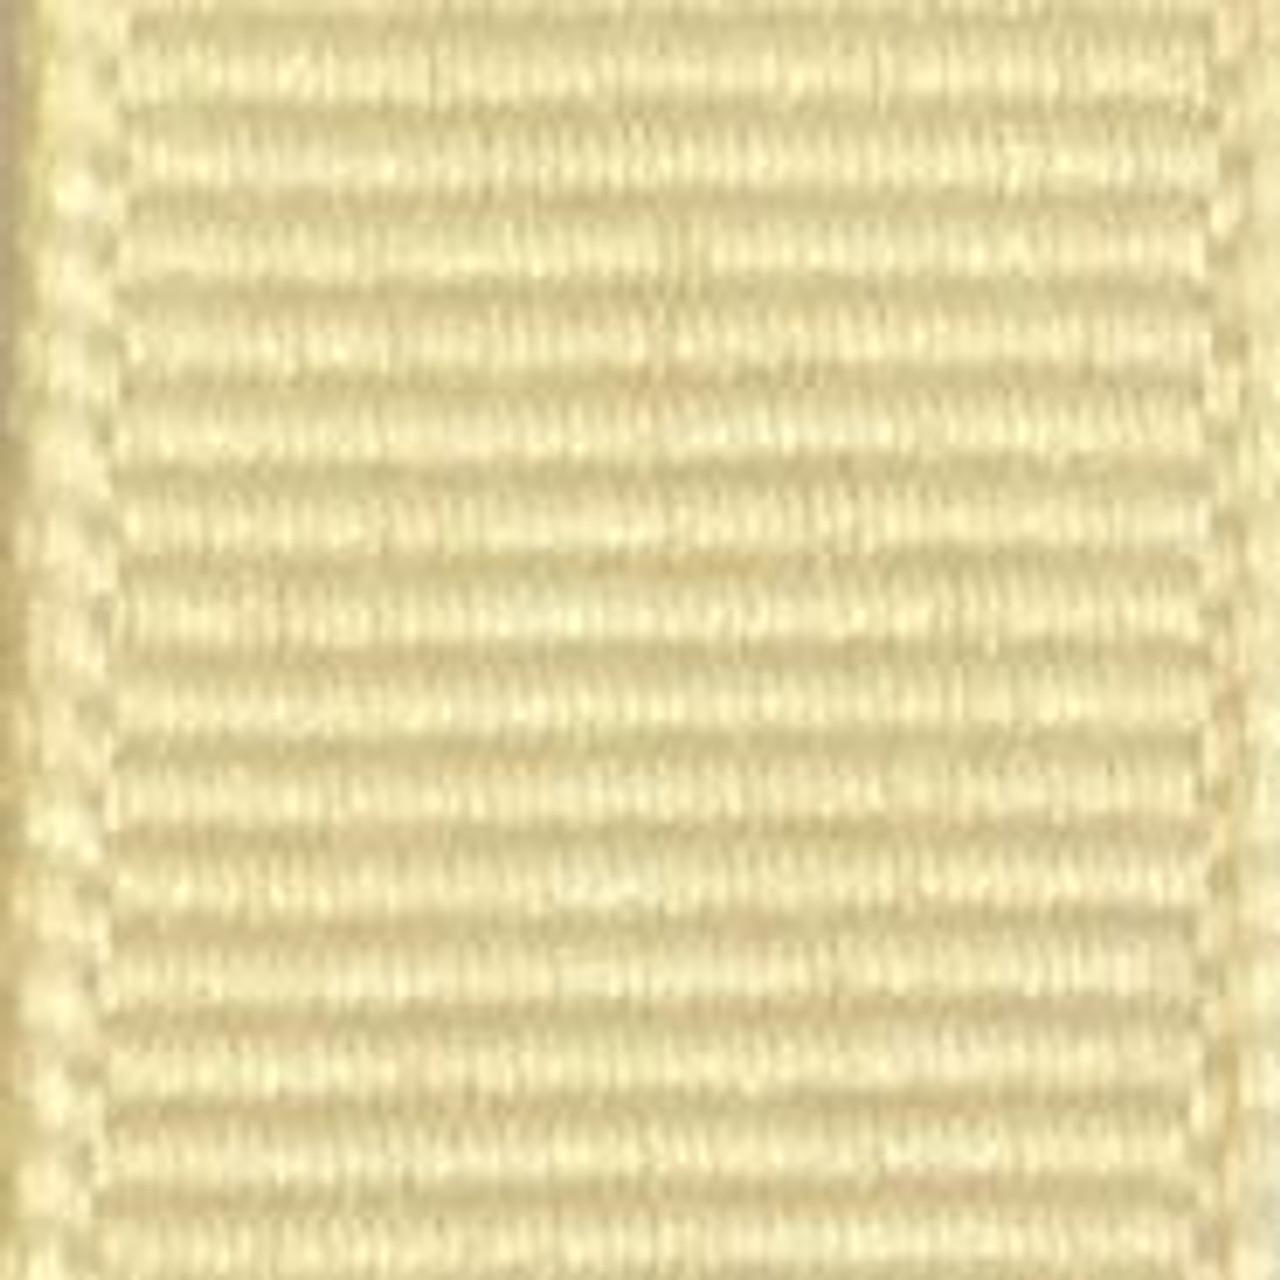 Wheat Offray Grosgrain Ribbon